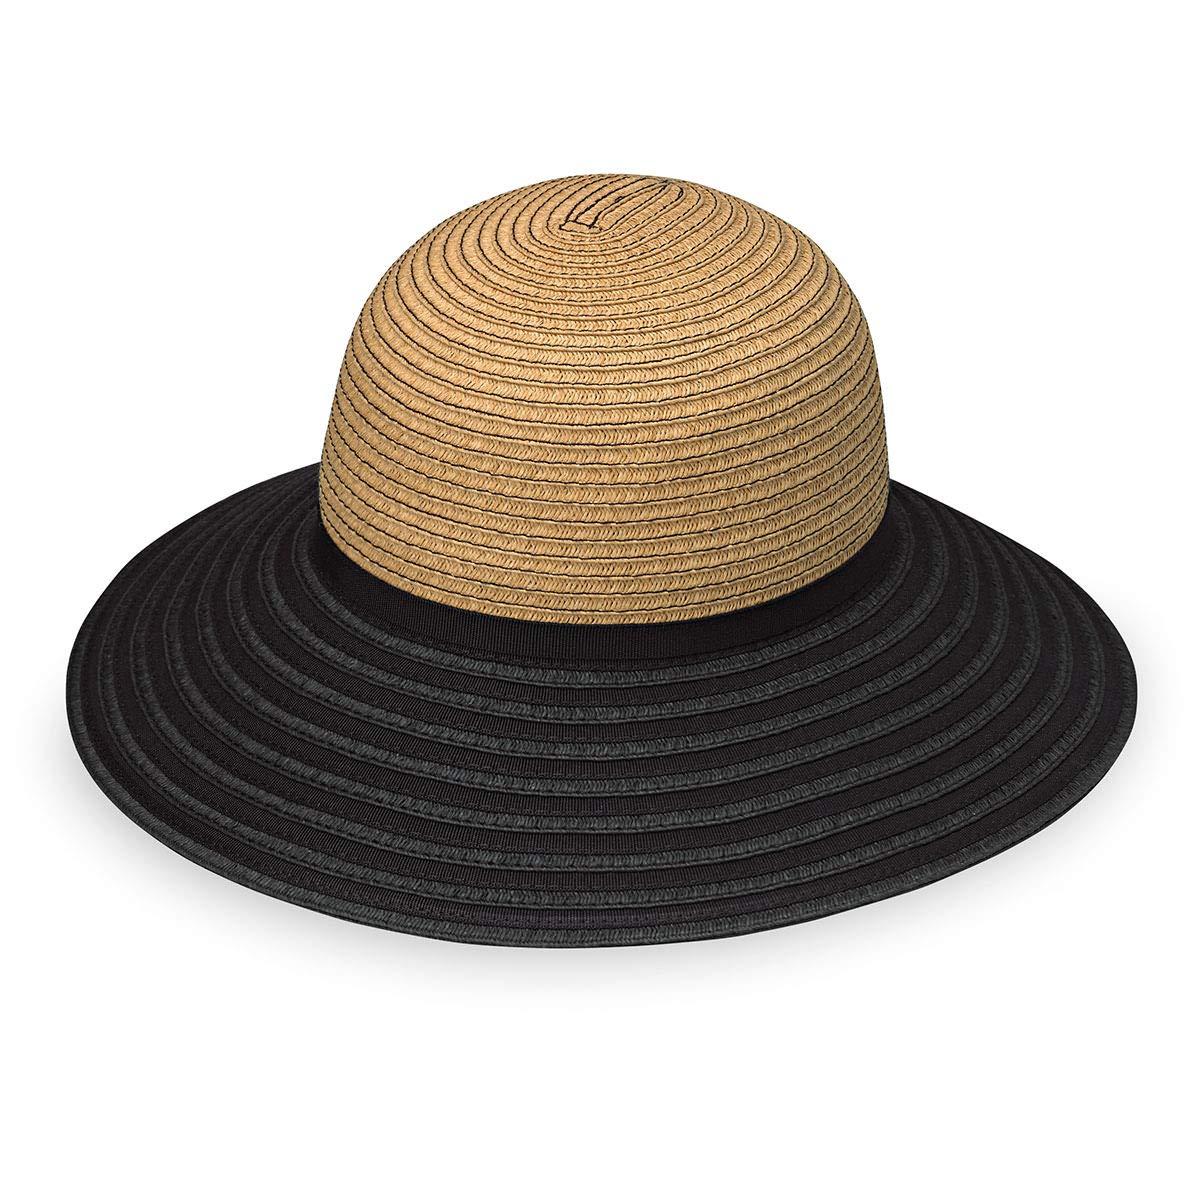 Wallaroo Hat Company Hat Company Women's Riviera Hat - Camel/Black - Broad Brim